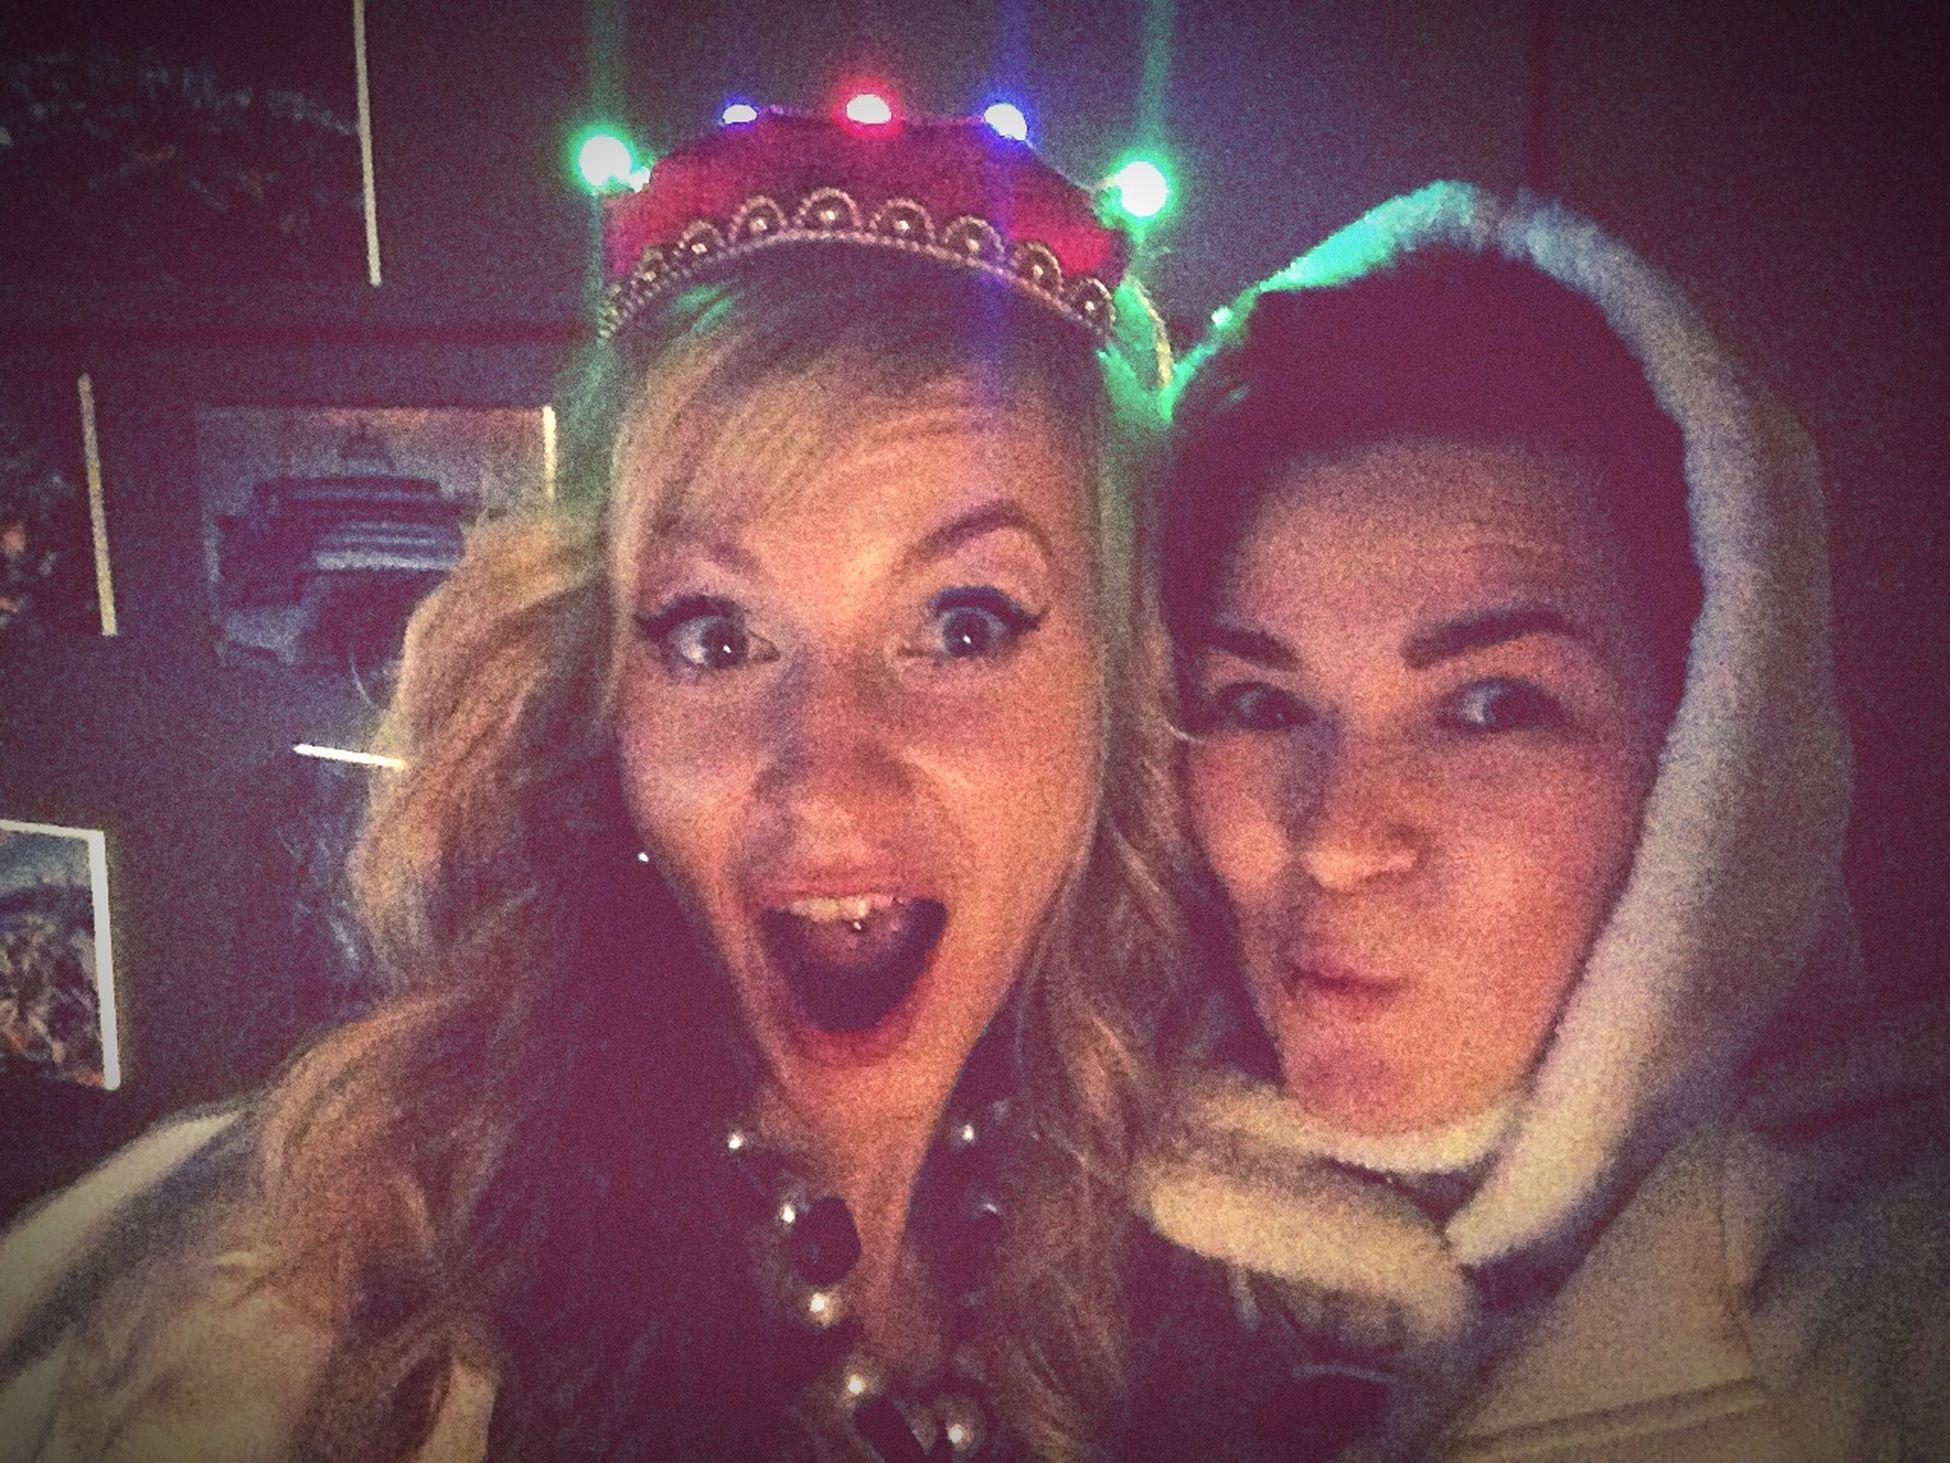 Fierycromn&northwoman Happy C: HBD!